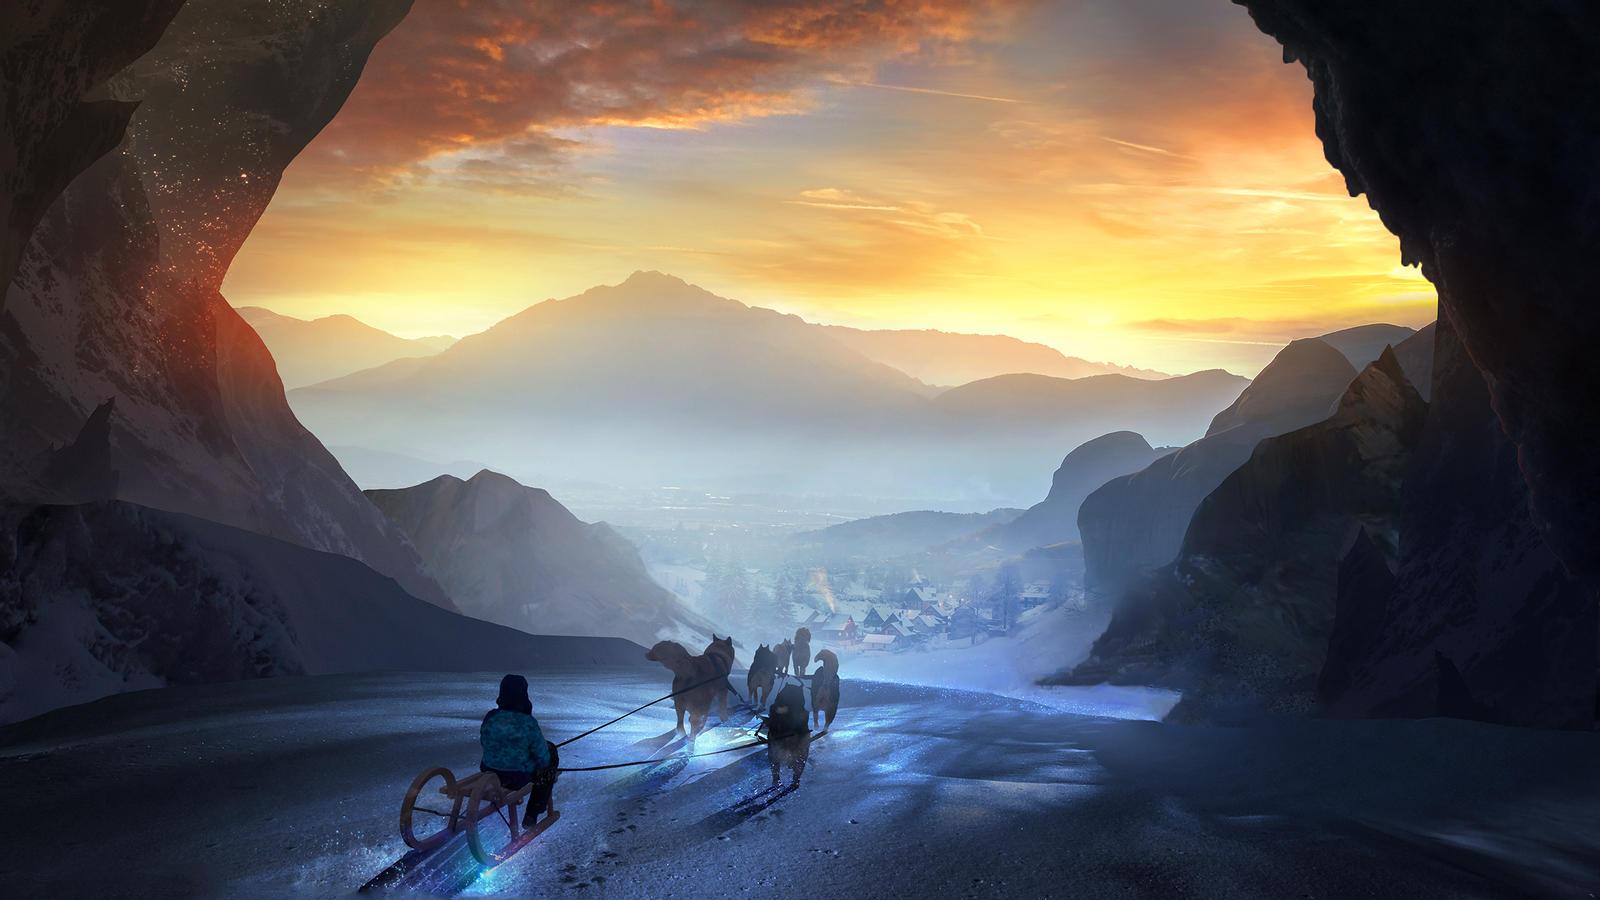 Digital Art T1na Fantasy Art 1600x900